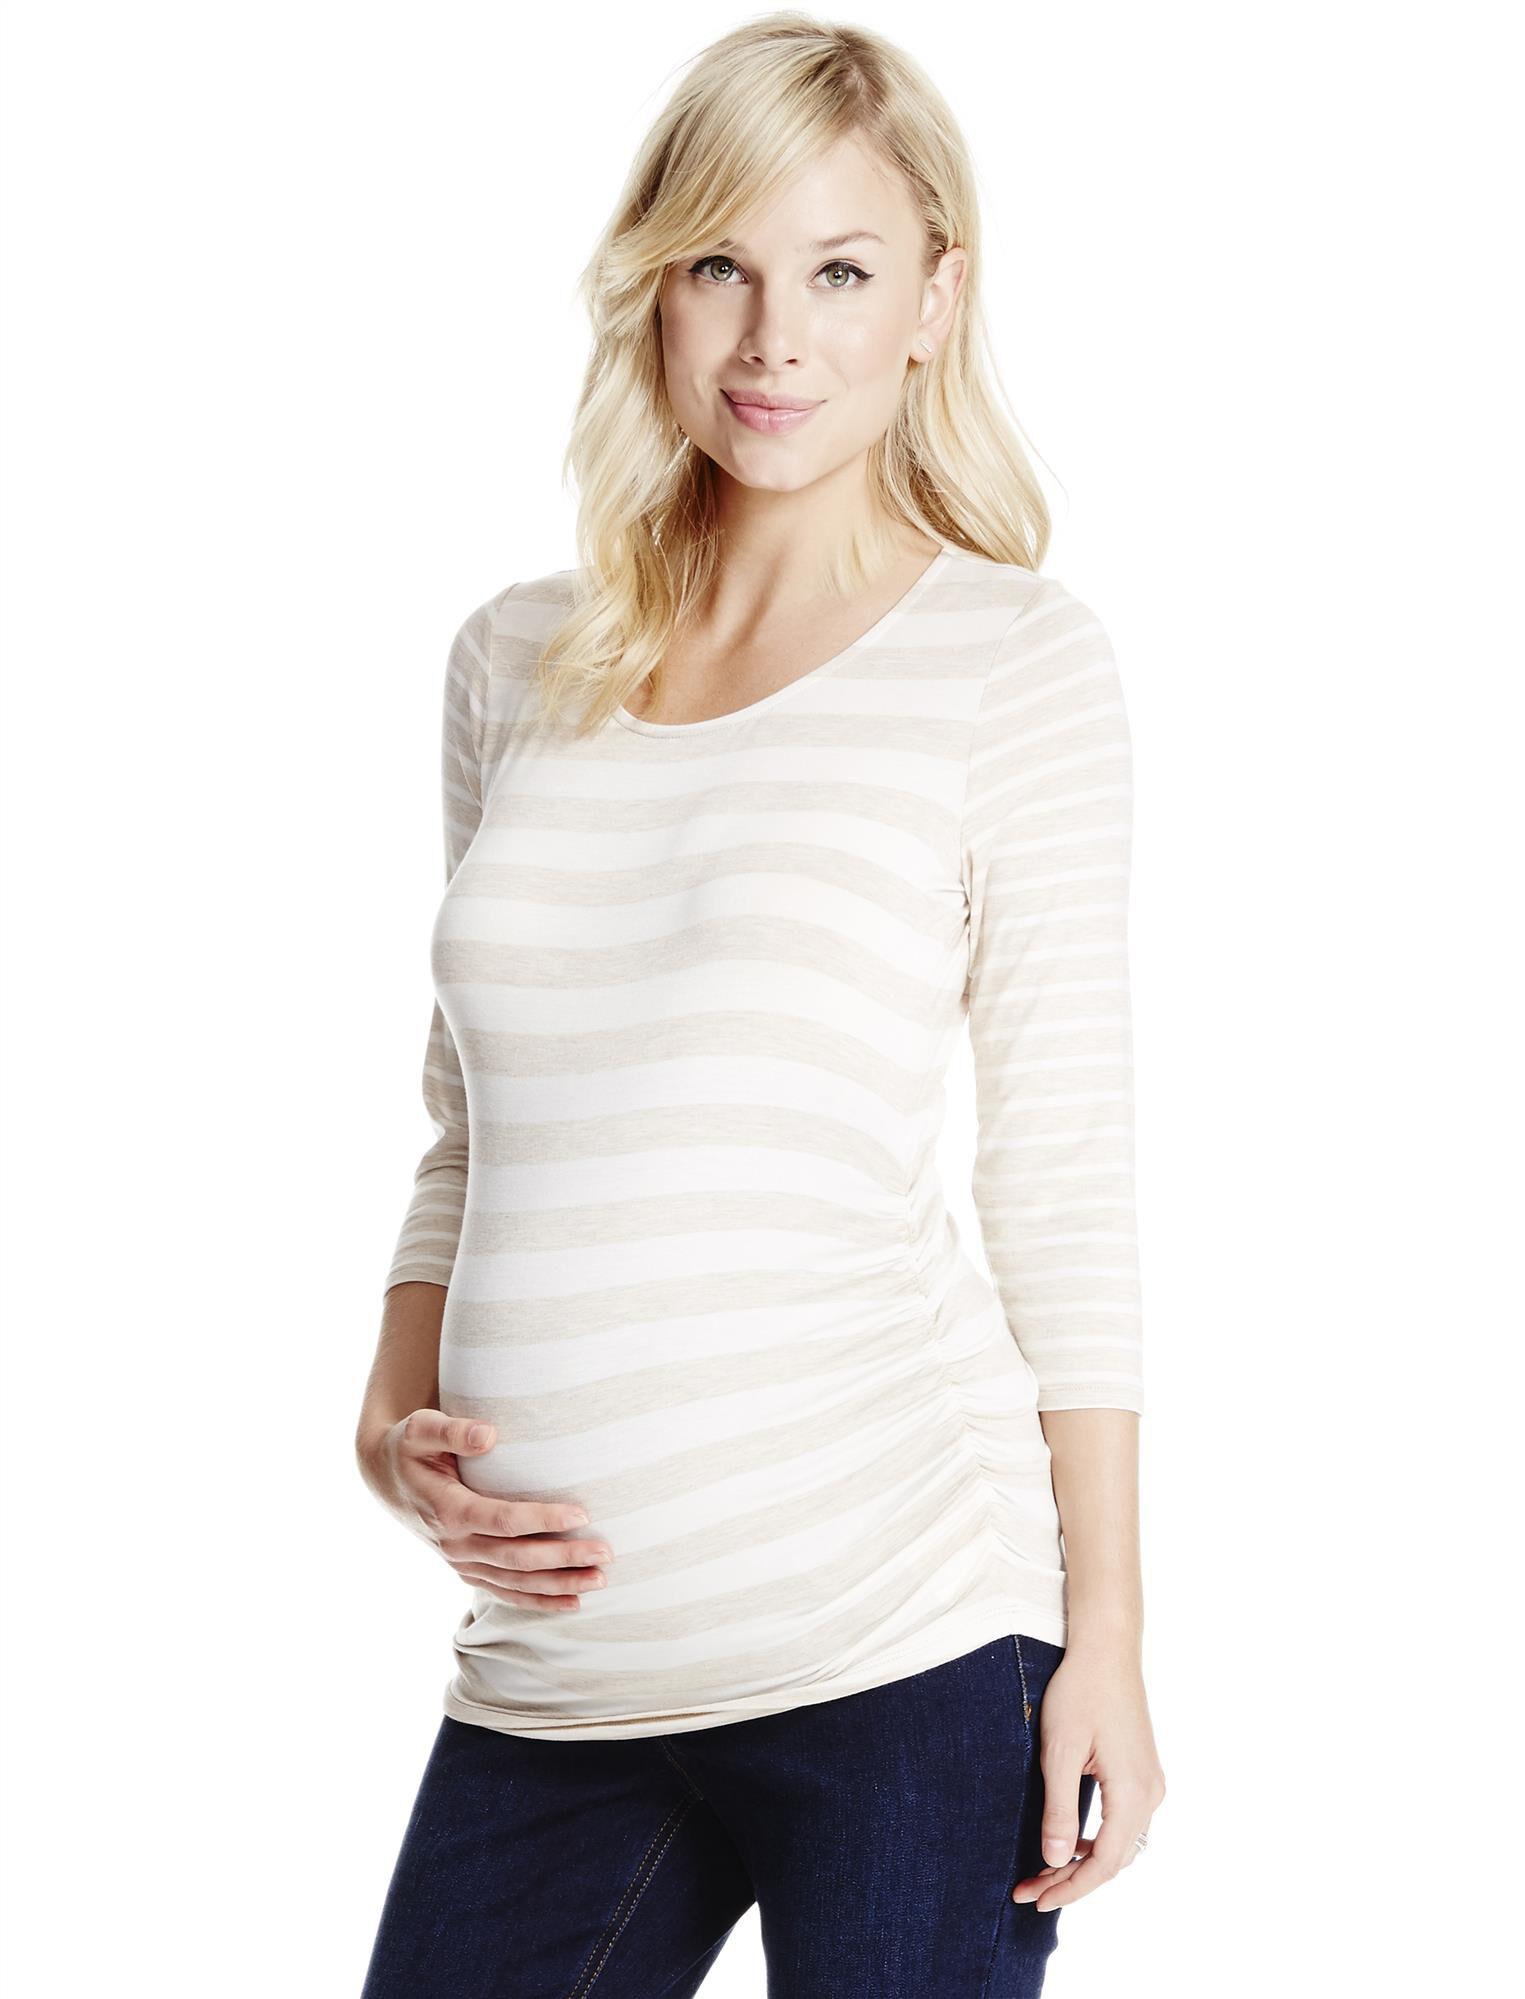 Jessica Simpson Lightweight Maternity T Shirt